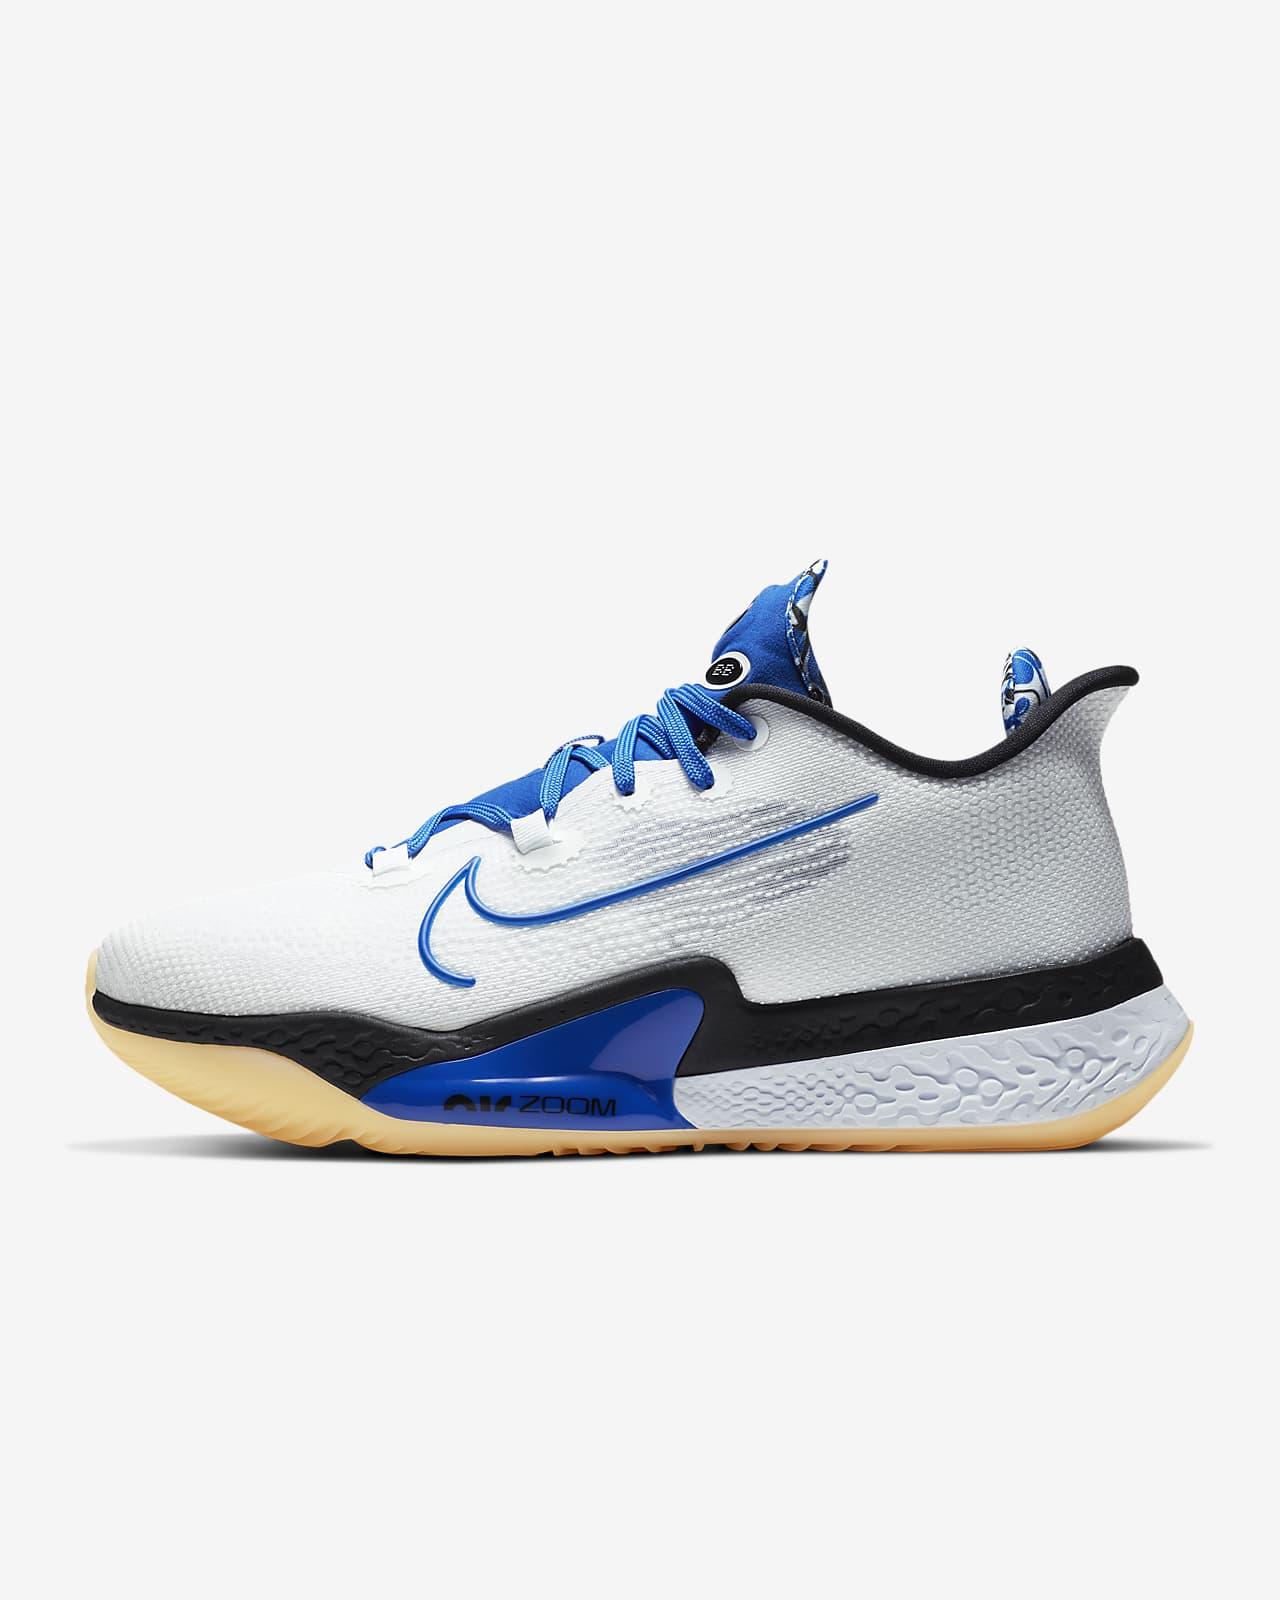 Chaussure de basketball Nike Air Zoom BB NXT « Sisterhood »